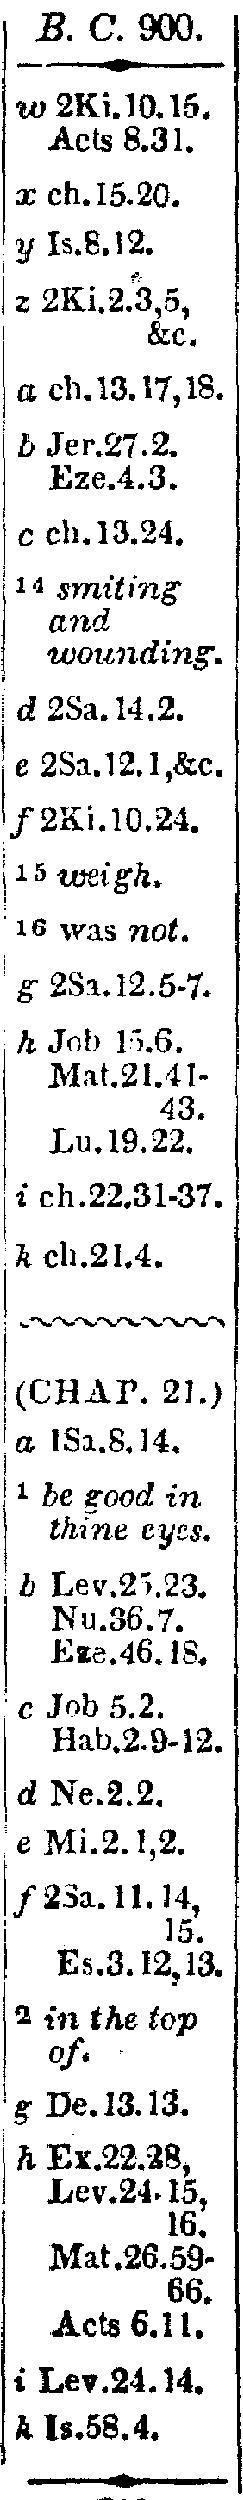 [merged small][ocr errors][ocr errors][merged small][ocr errors][ocr errors][ocr errors][merged small][merged small][ocr errors][merged small][merged small][ocr errors][ocr errors][ocr errors][merged small][ocr errors][merged small][ocr errors]